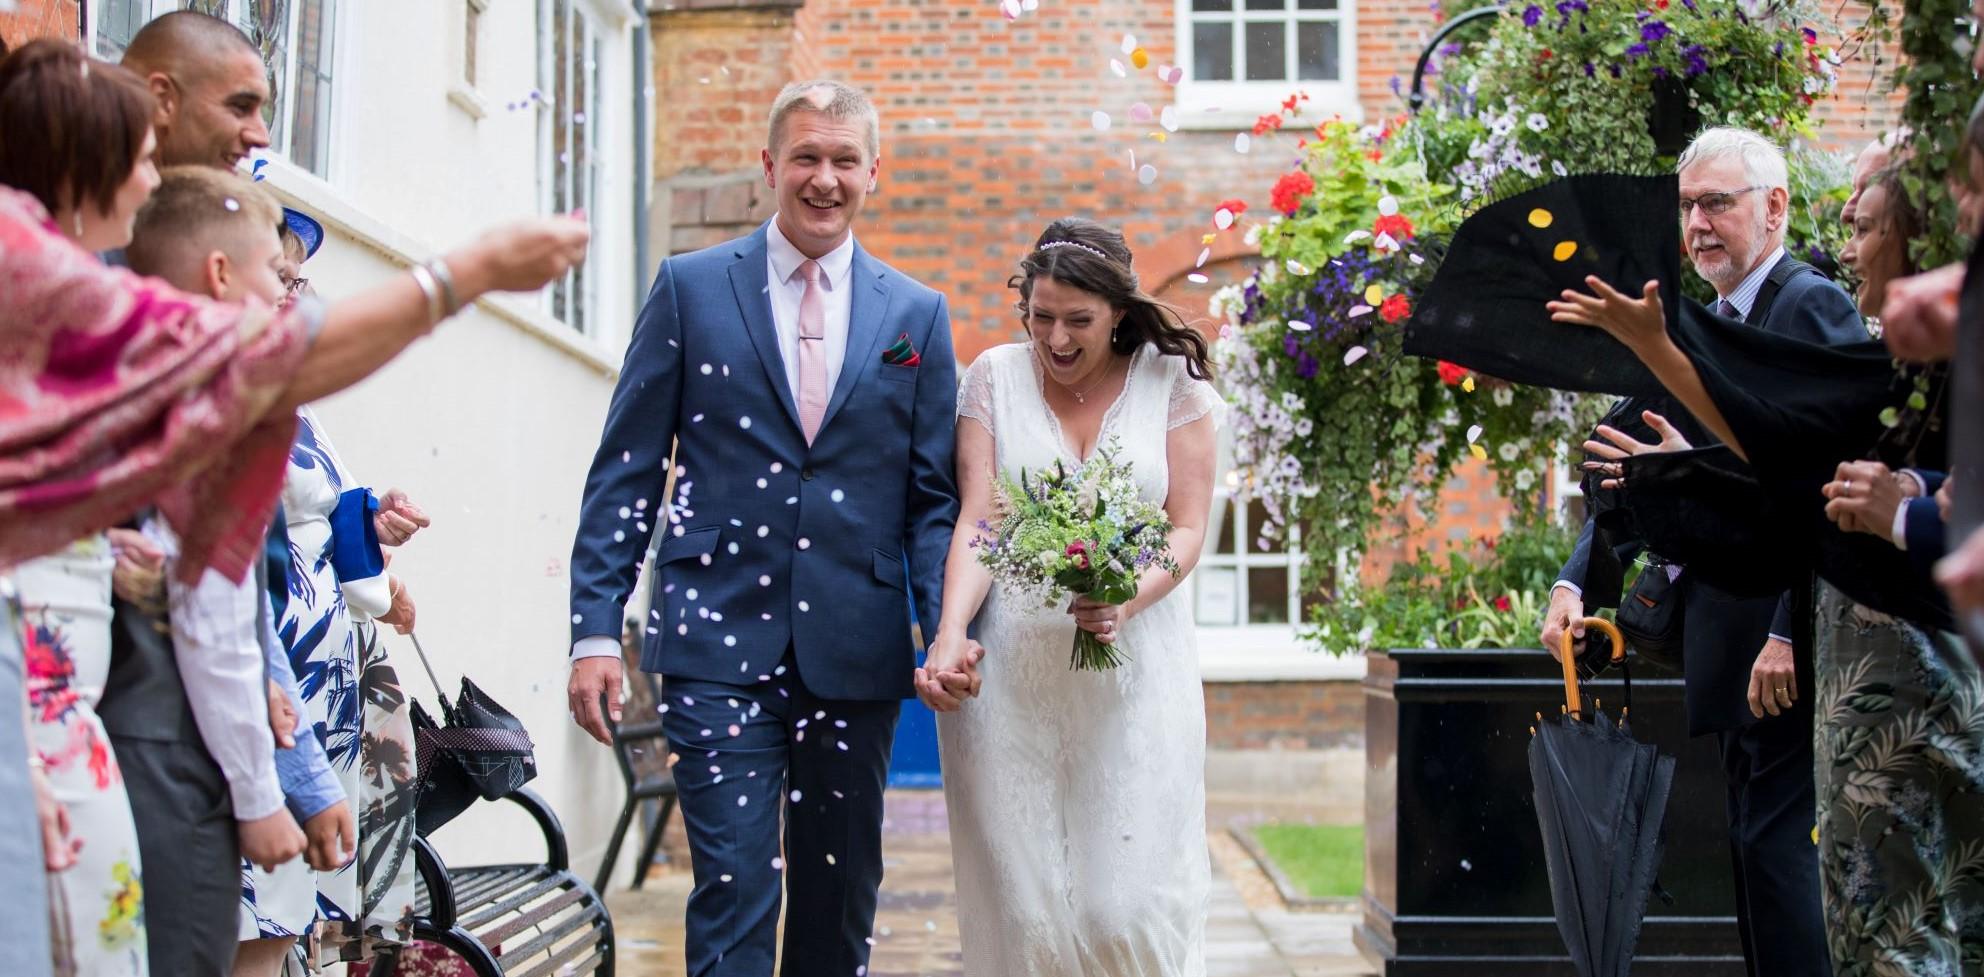 31 guests throw confetti registry office roysse court abingdon oxford wedding photographer1